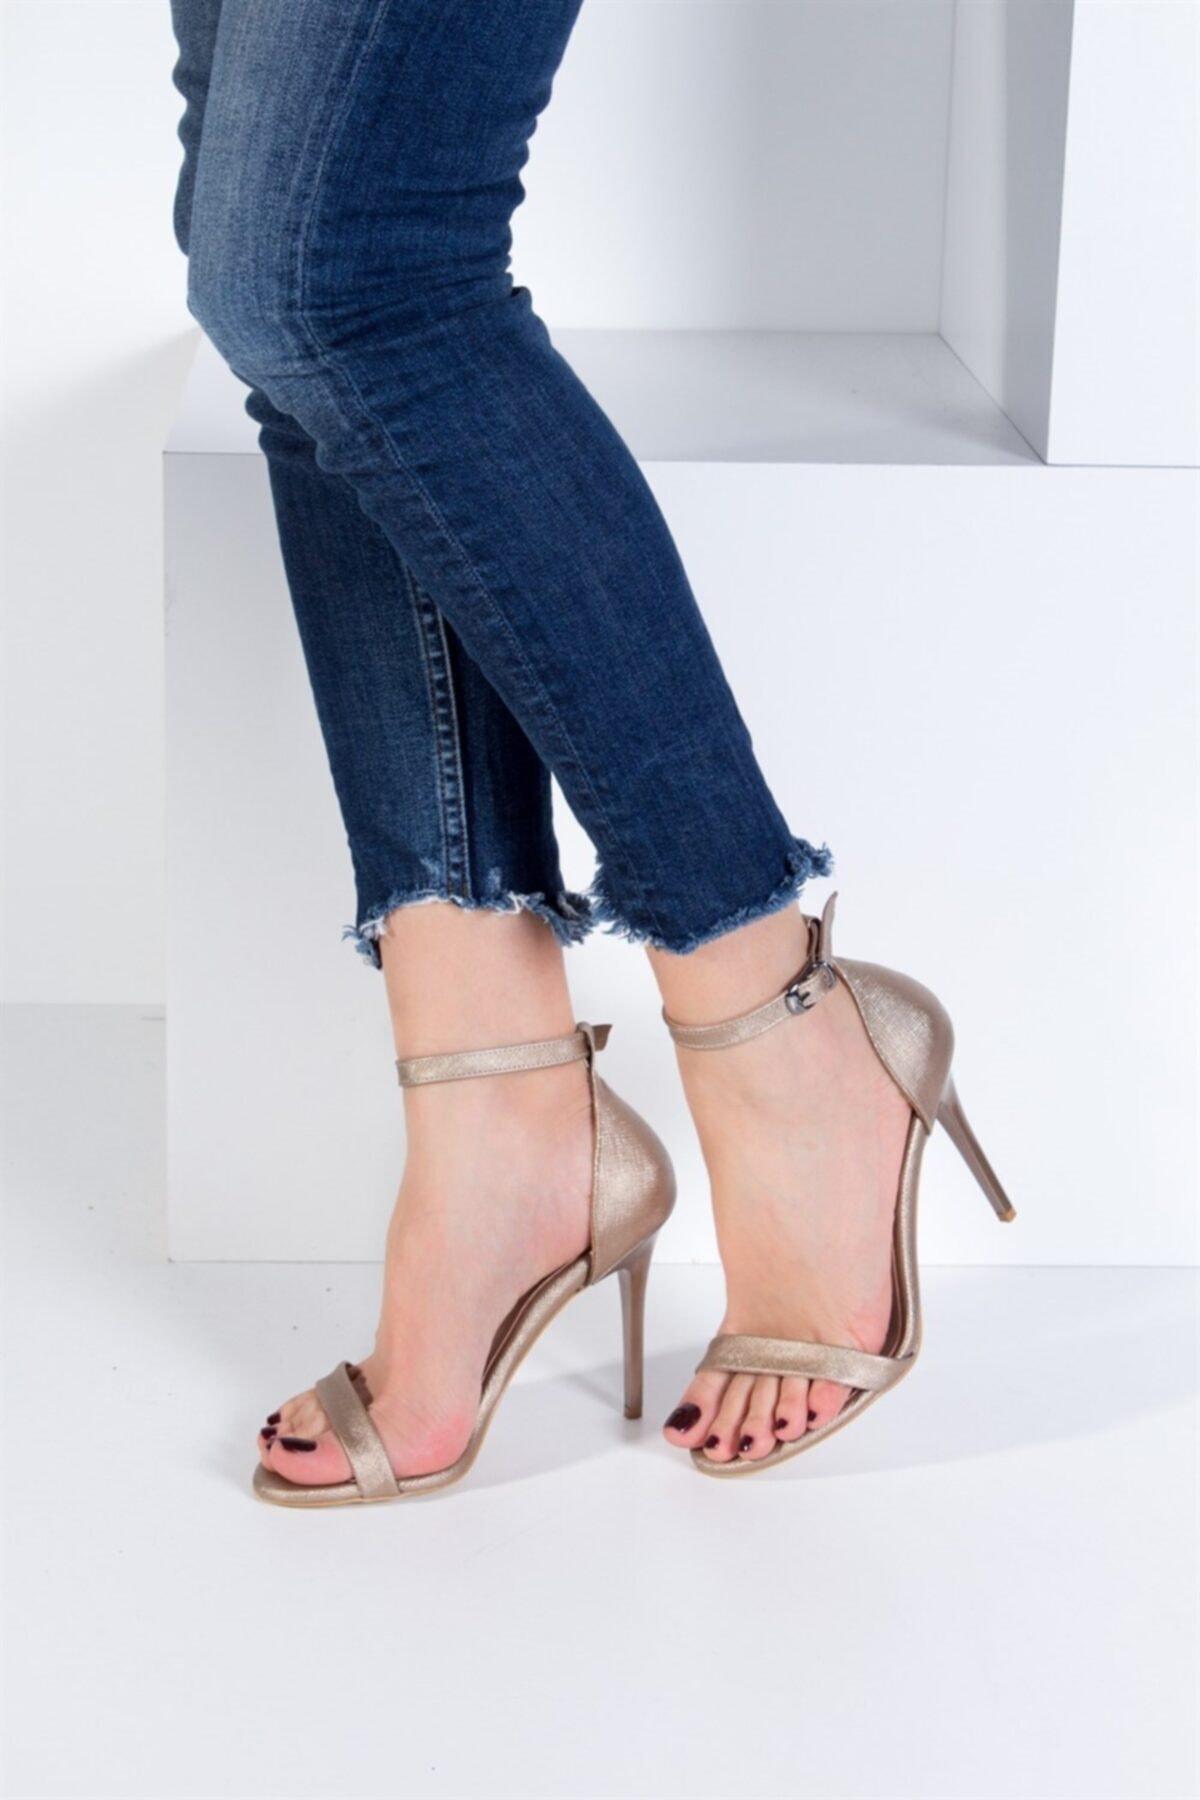 Fox Shoes Platin Kadın Topuklu Ayakkabı B922112609 2